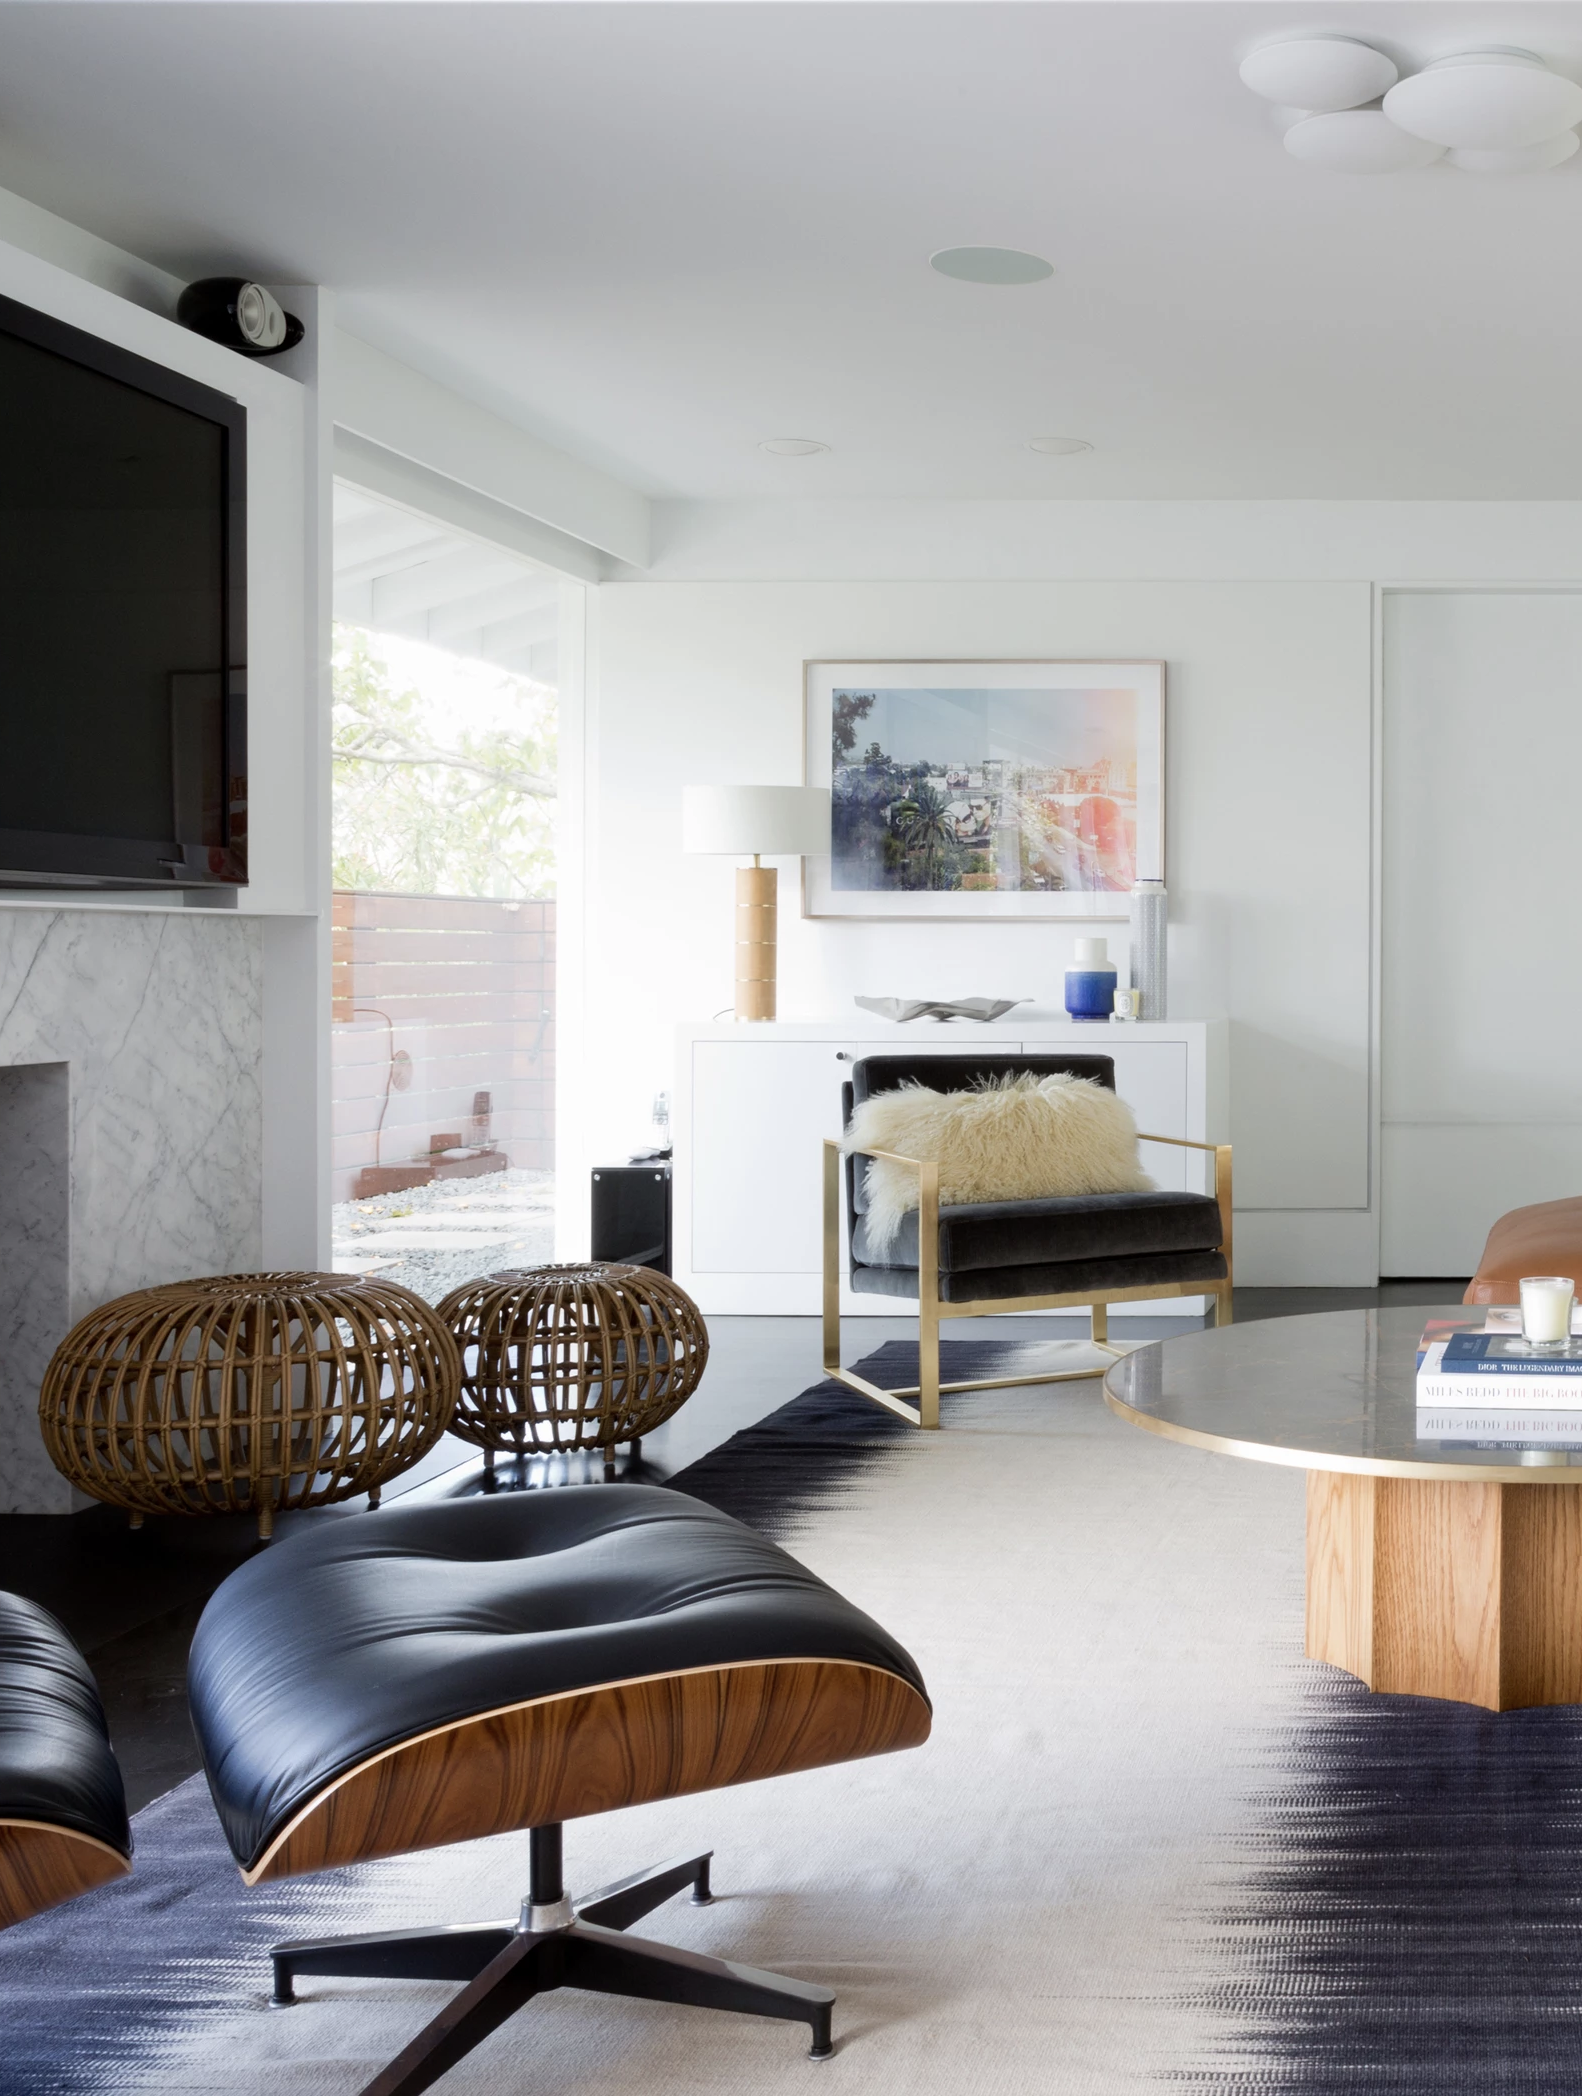 Courtesy of Veneer Designs & 10 Best Modern Living Room Design Ideas in 2018 - Modern Living Room ...